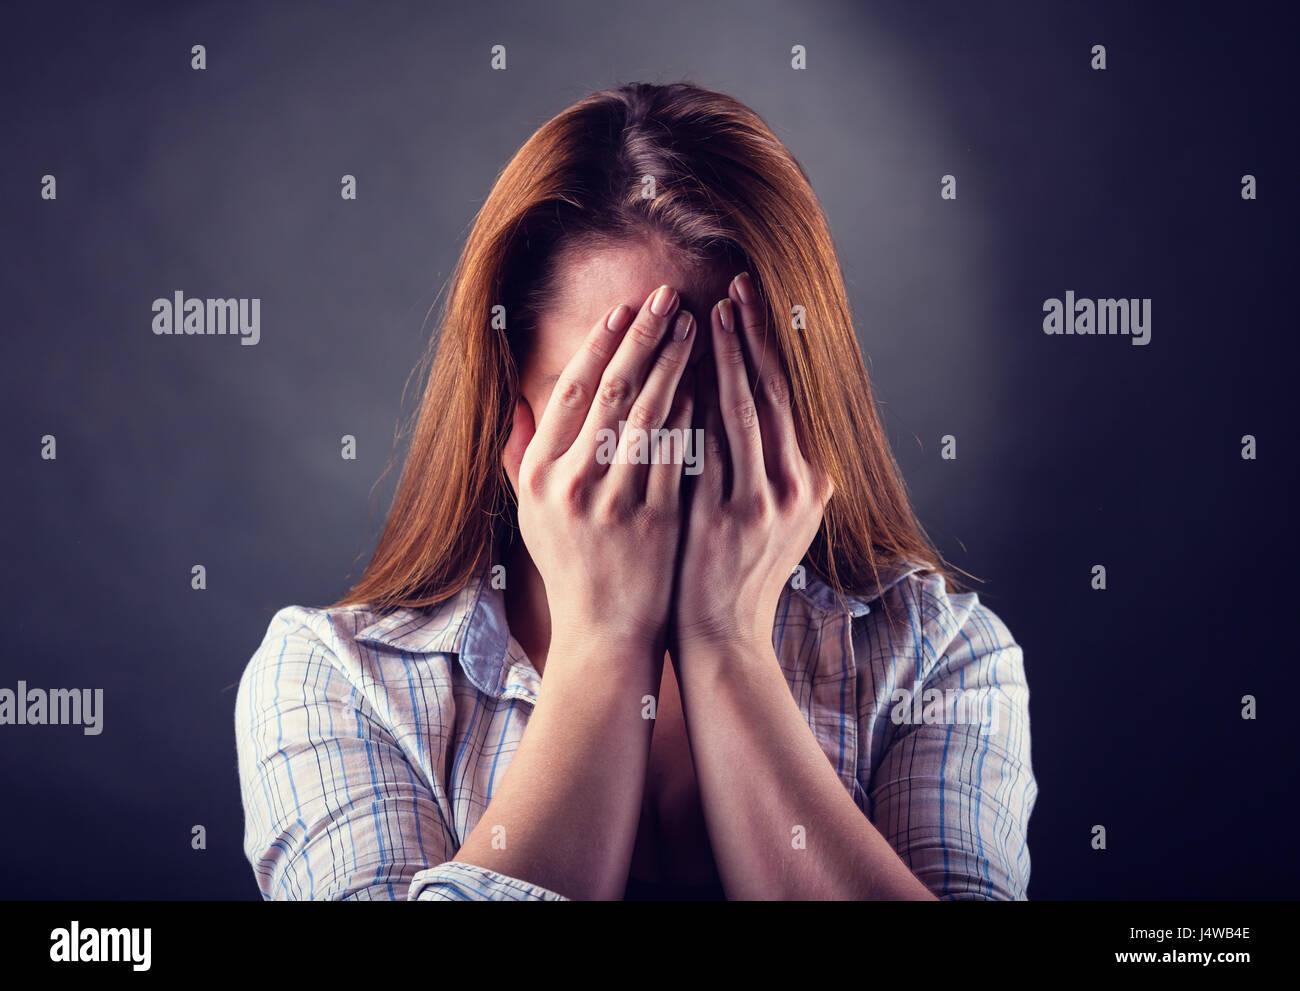 Mujer llorando sobre un fondo oscuro Imagen De Stock